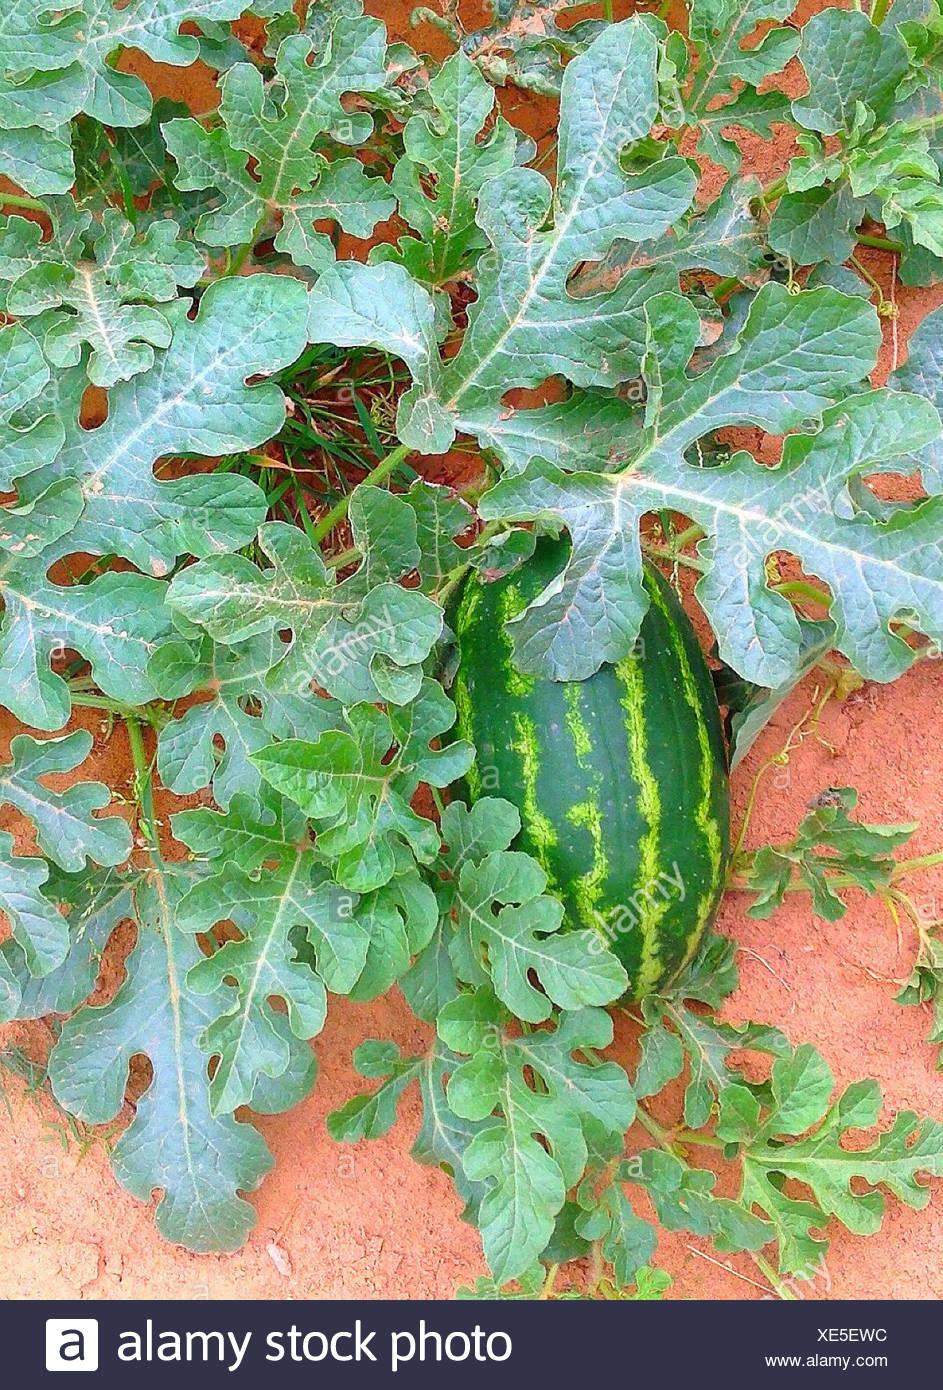 USA, Texas, Dimmit County, Wassermelonen wachsen auf Feld Stockbild